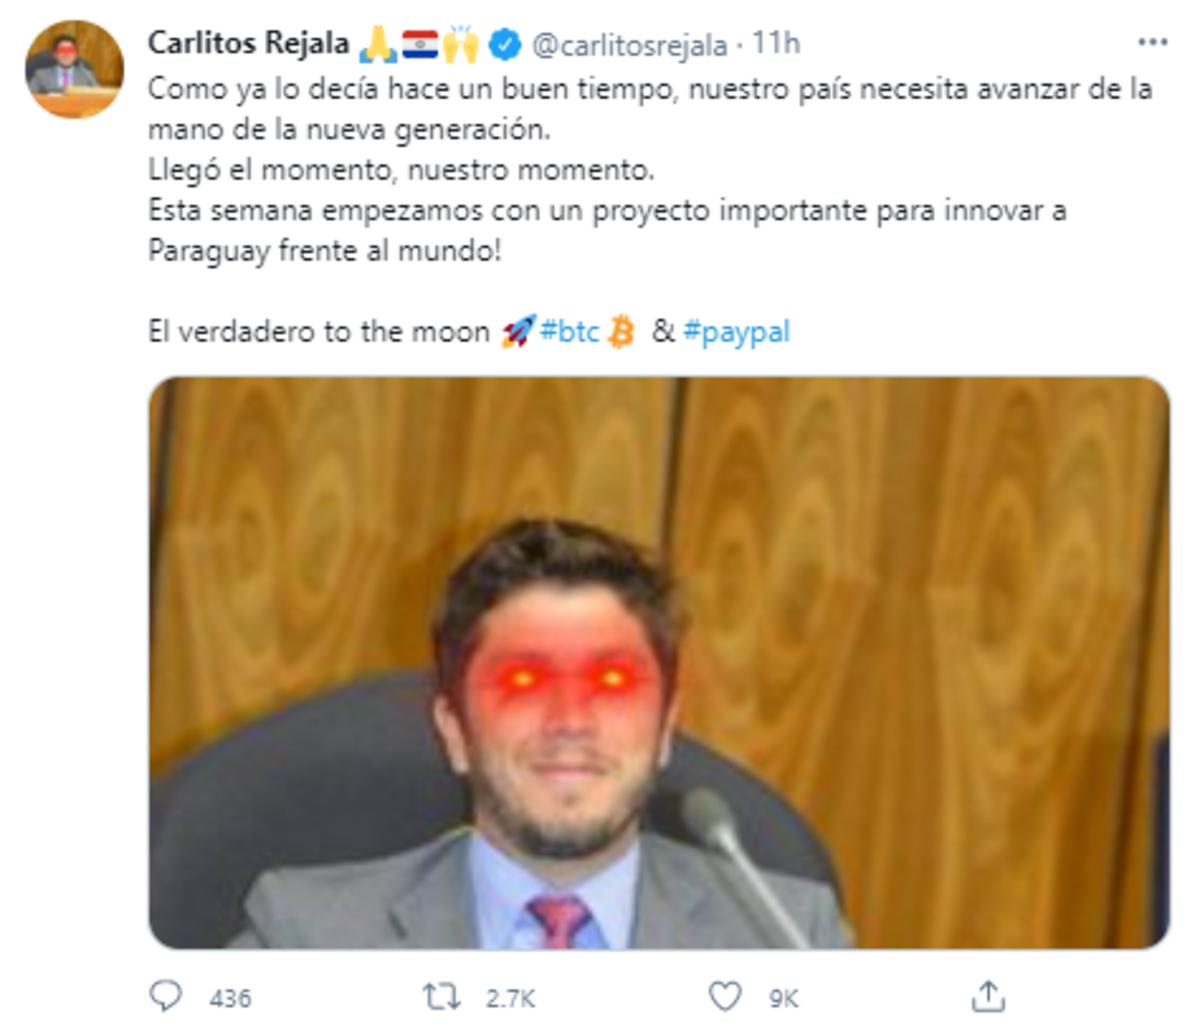 https://twitter.com/carlitosrejala/status/1401712725886132224